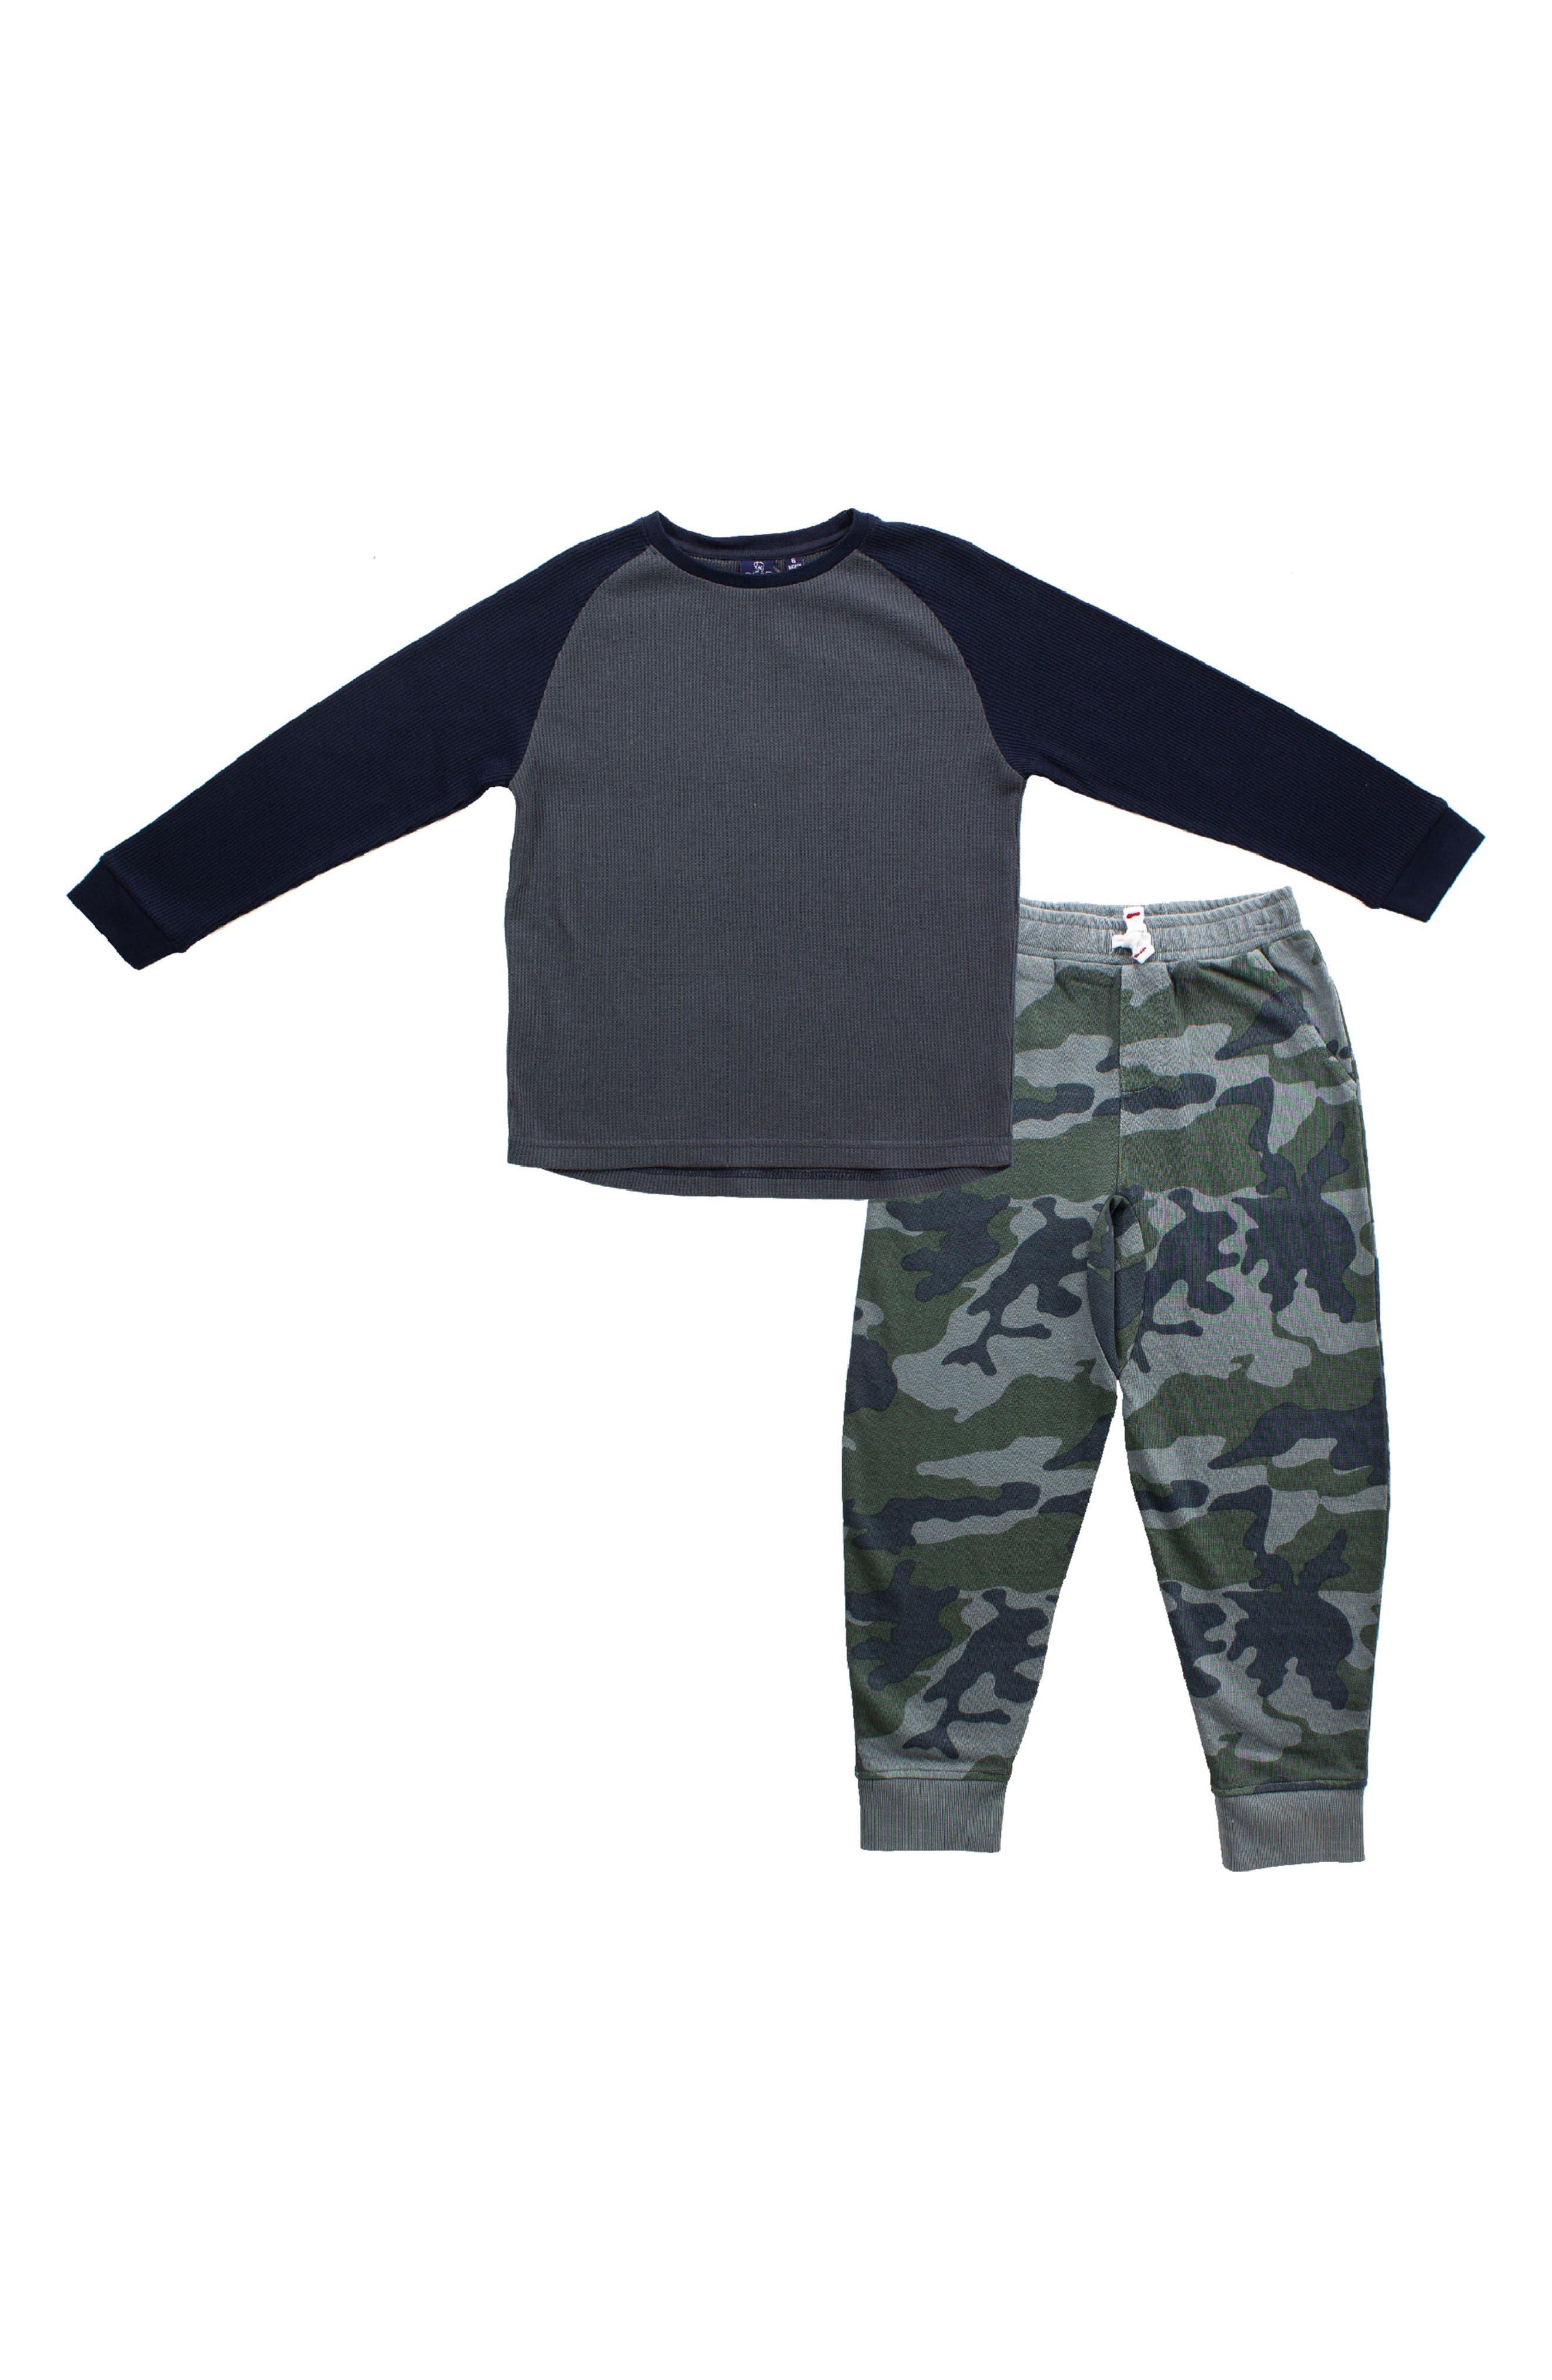 Kids Little Boys Short Sleeve Moms MCM Tshirt Camo Pants Outfits Clothes Set